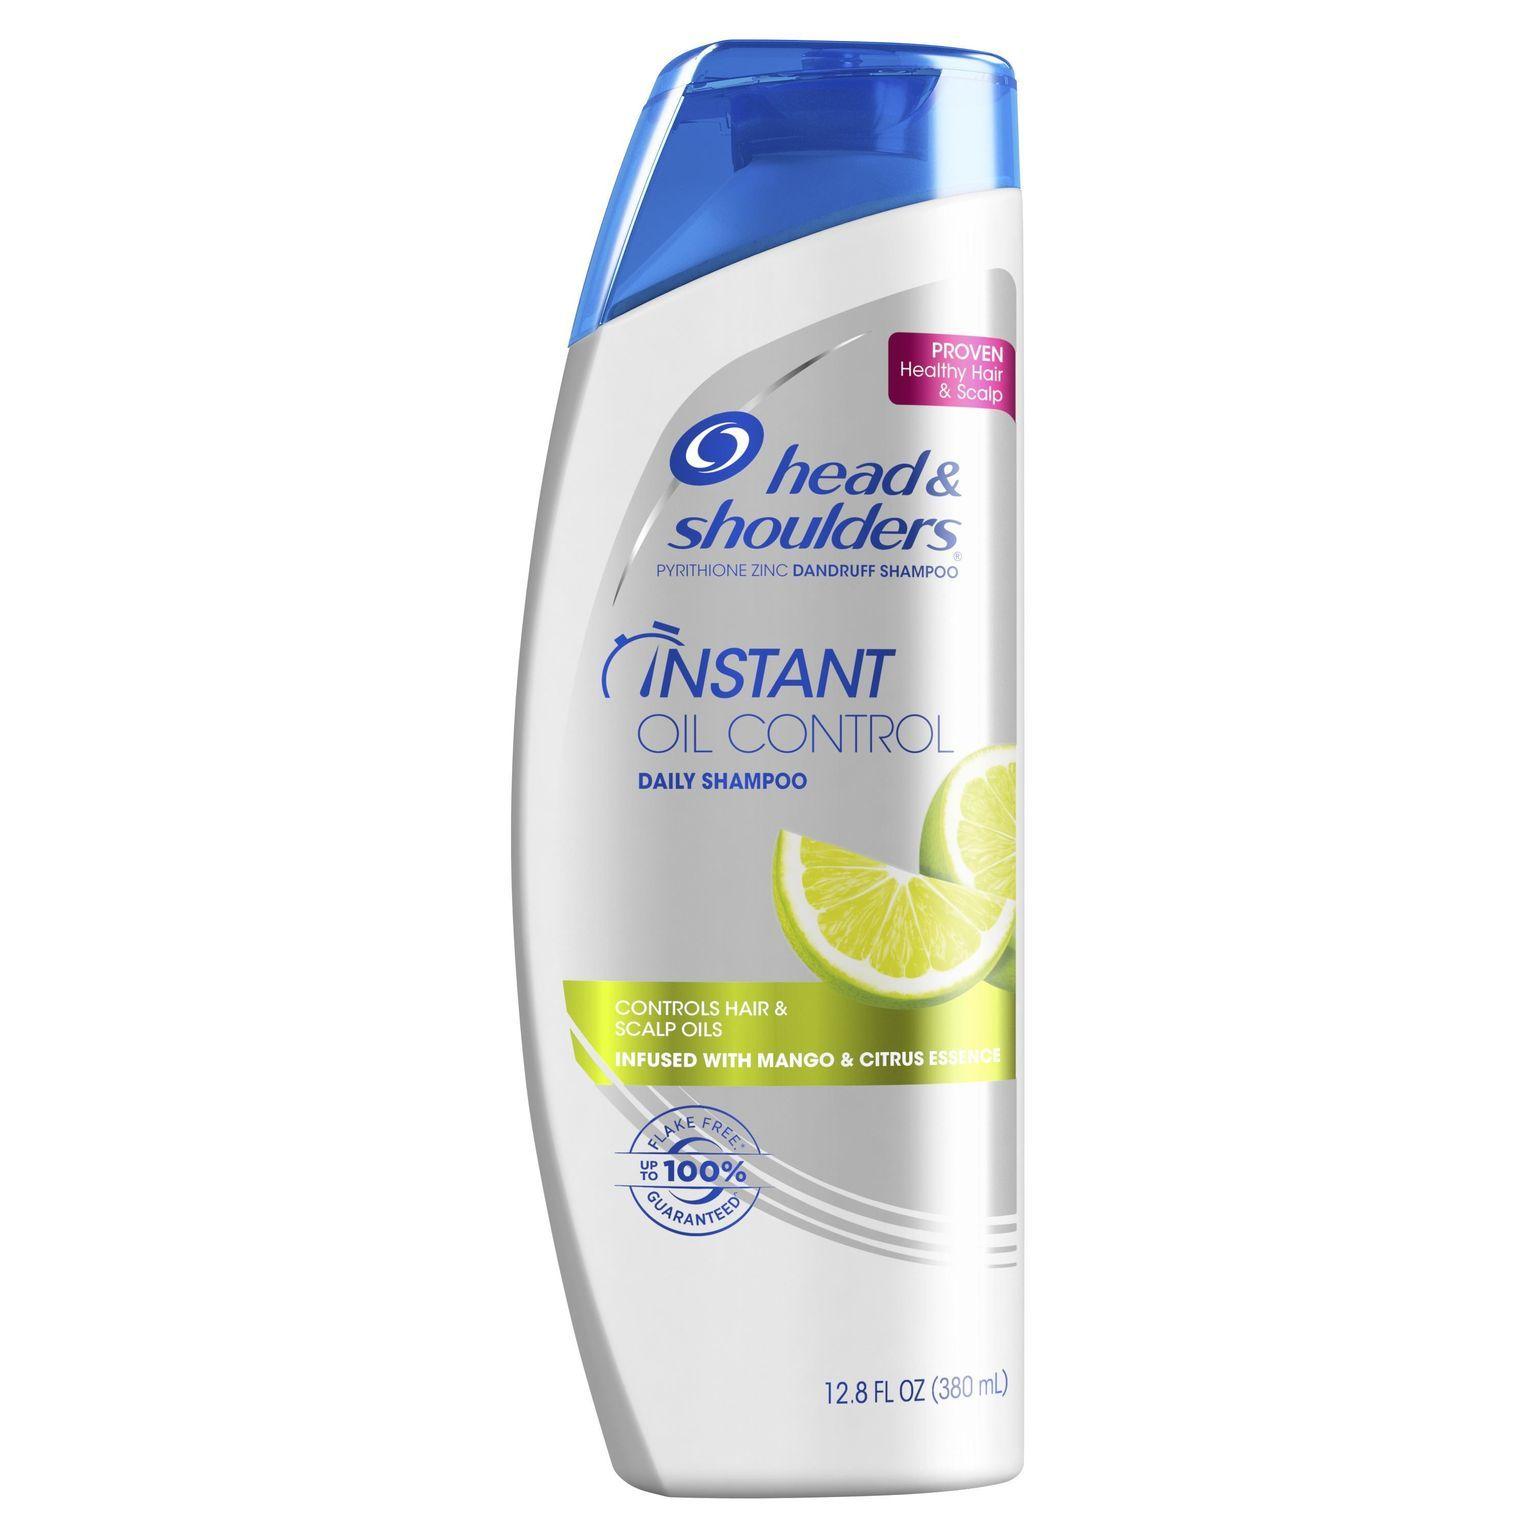 Instant Oil Control Daily Dandruff Shampoo